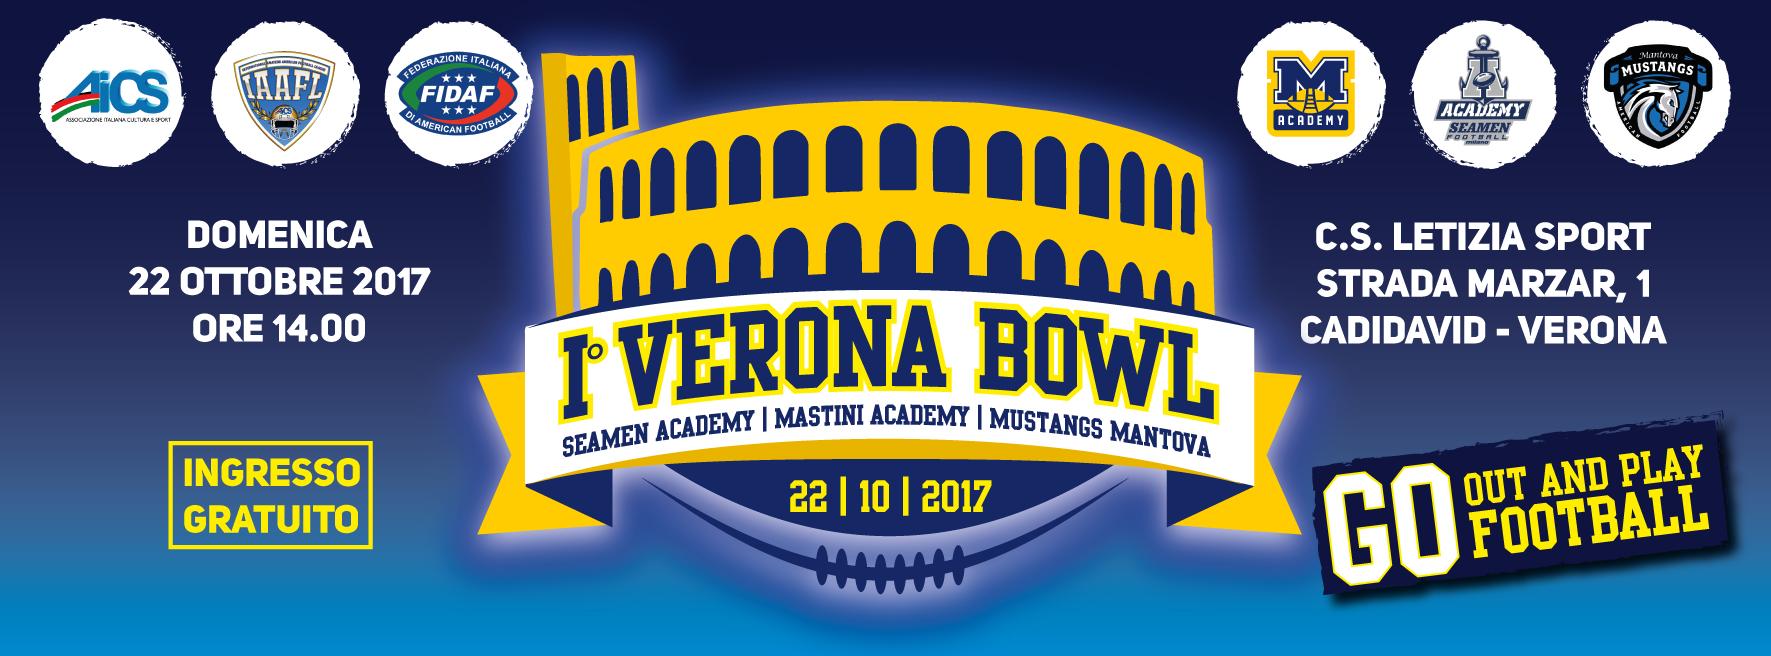 Verona Bowl 2017